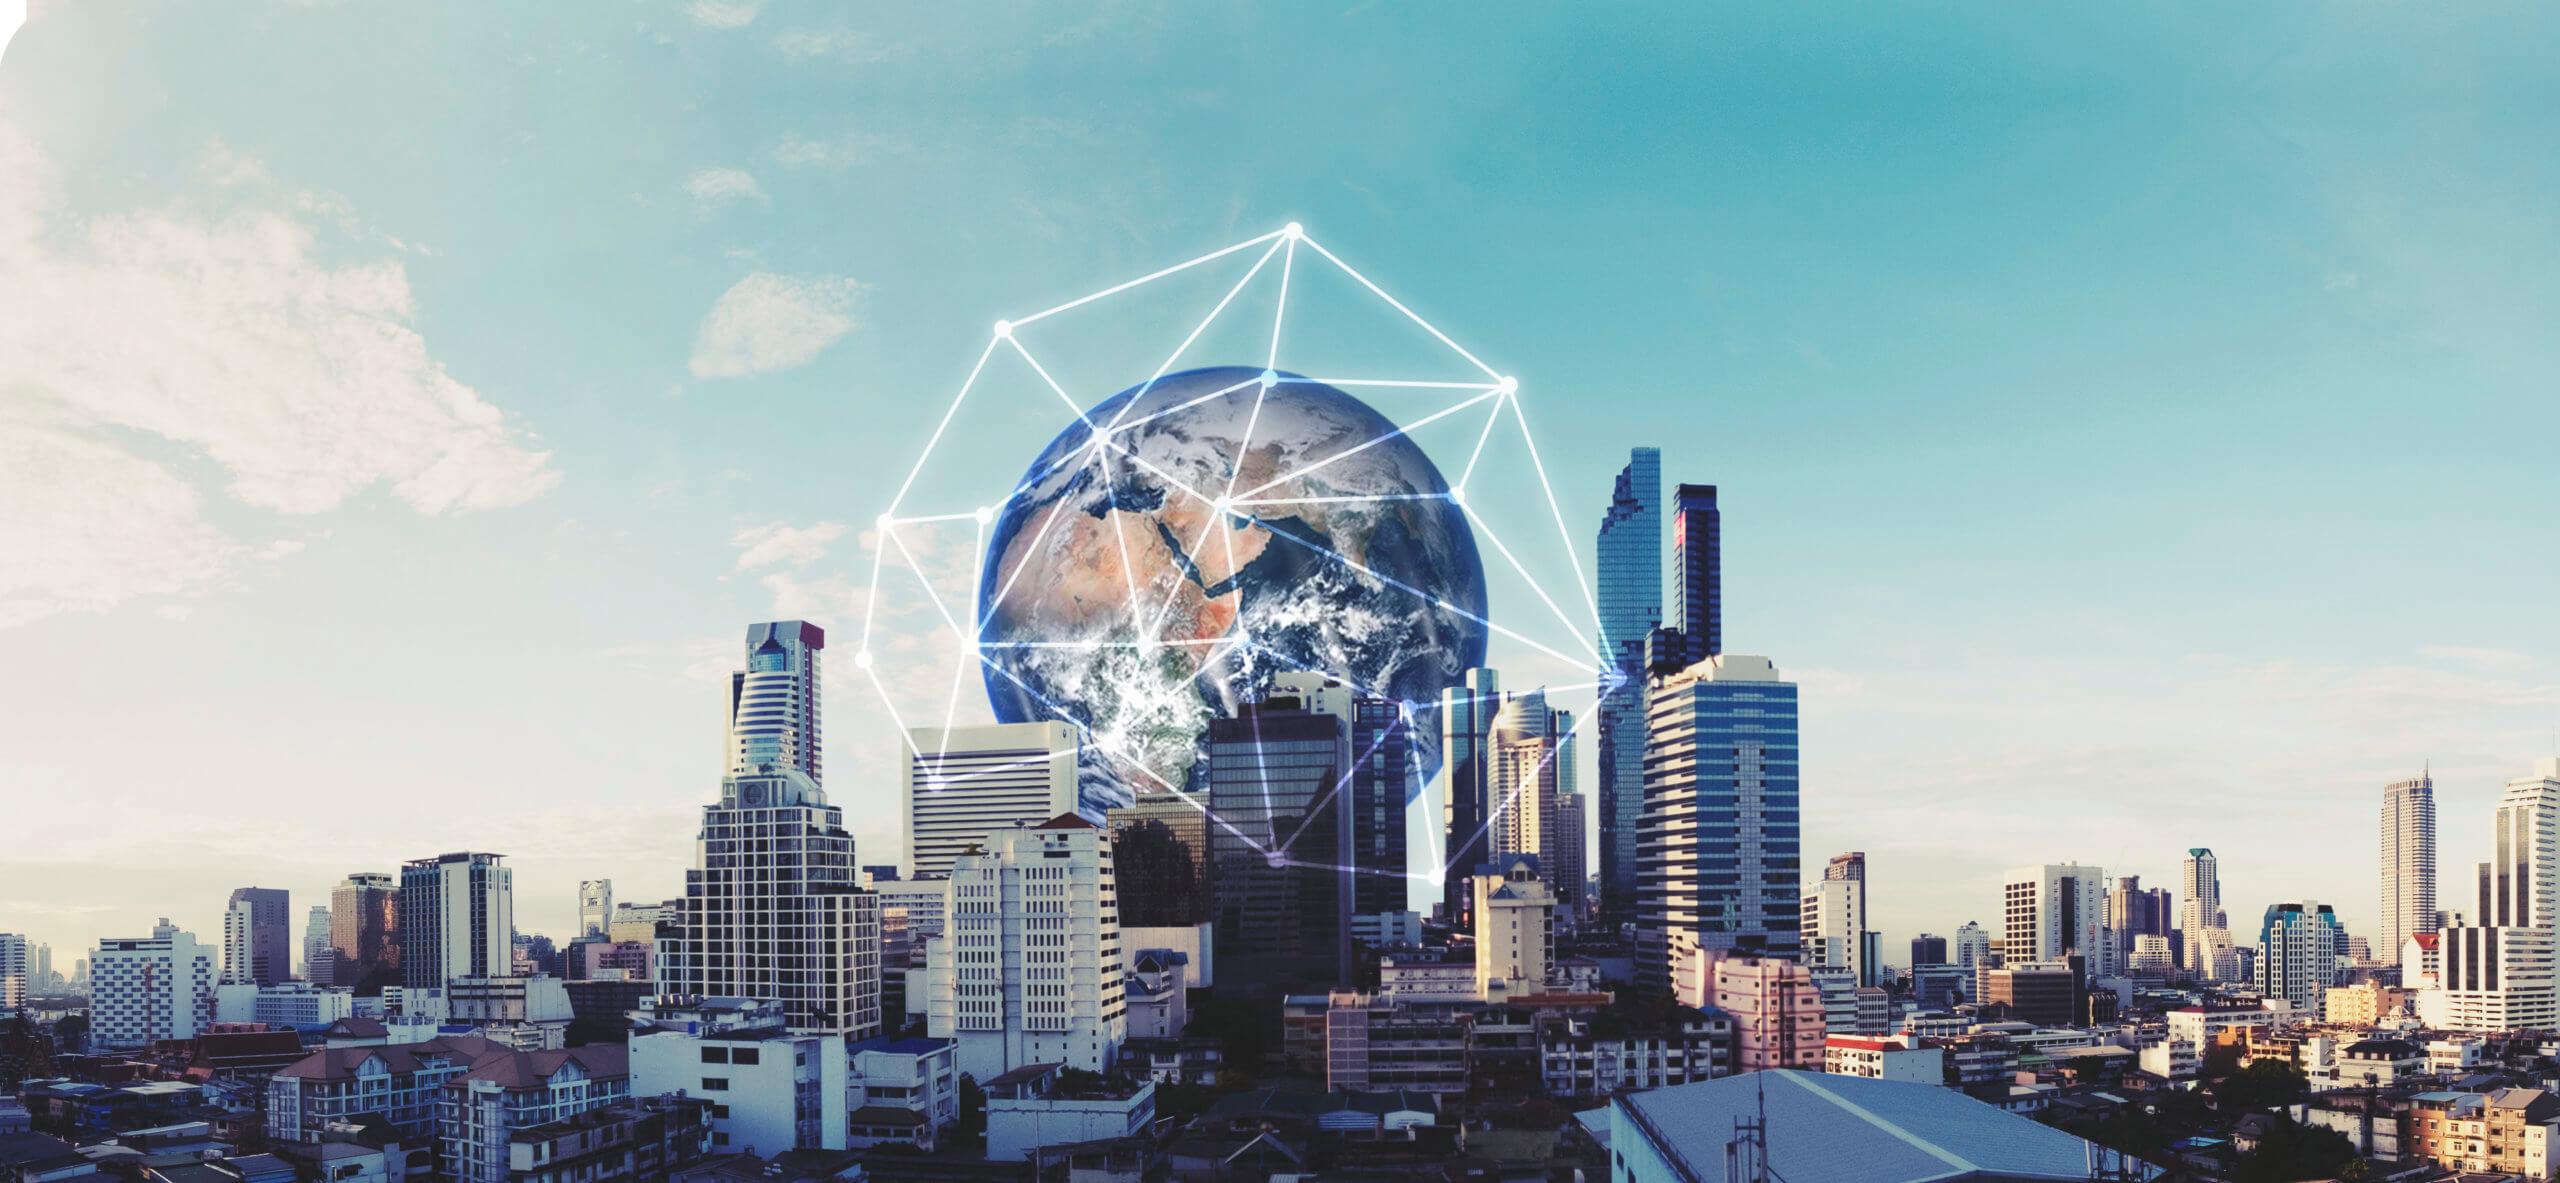 Accelerating Urban Tourism and Economies - Global Travel